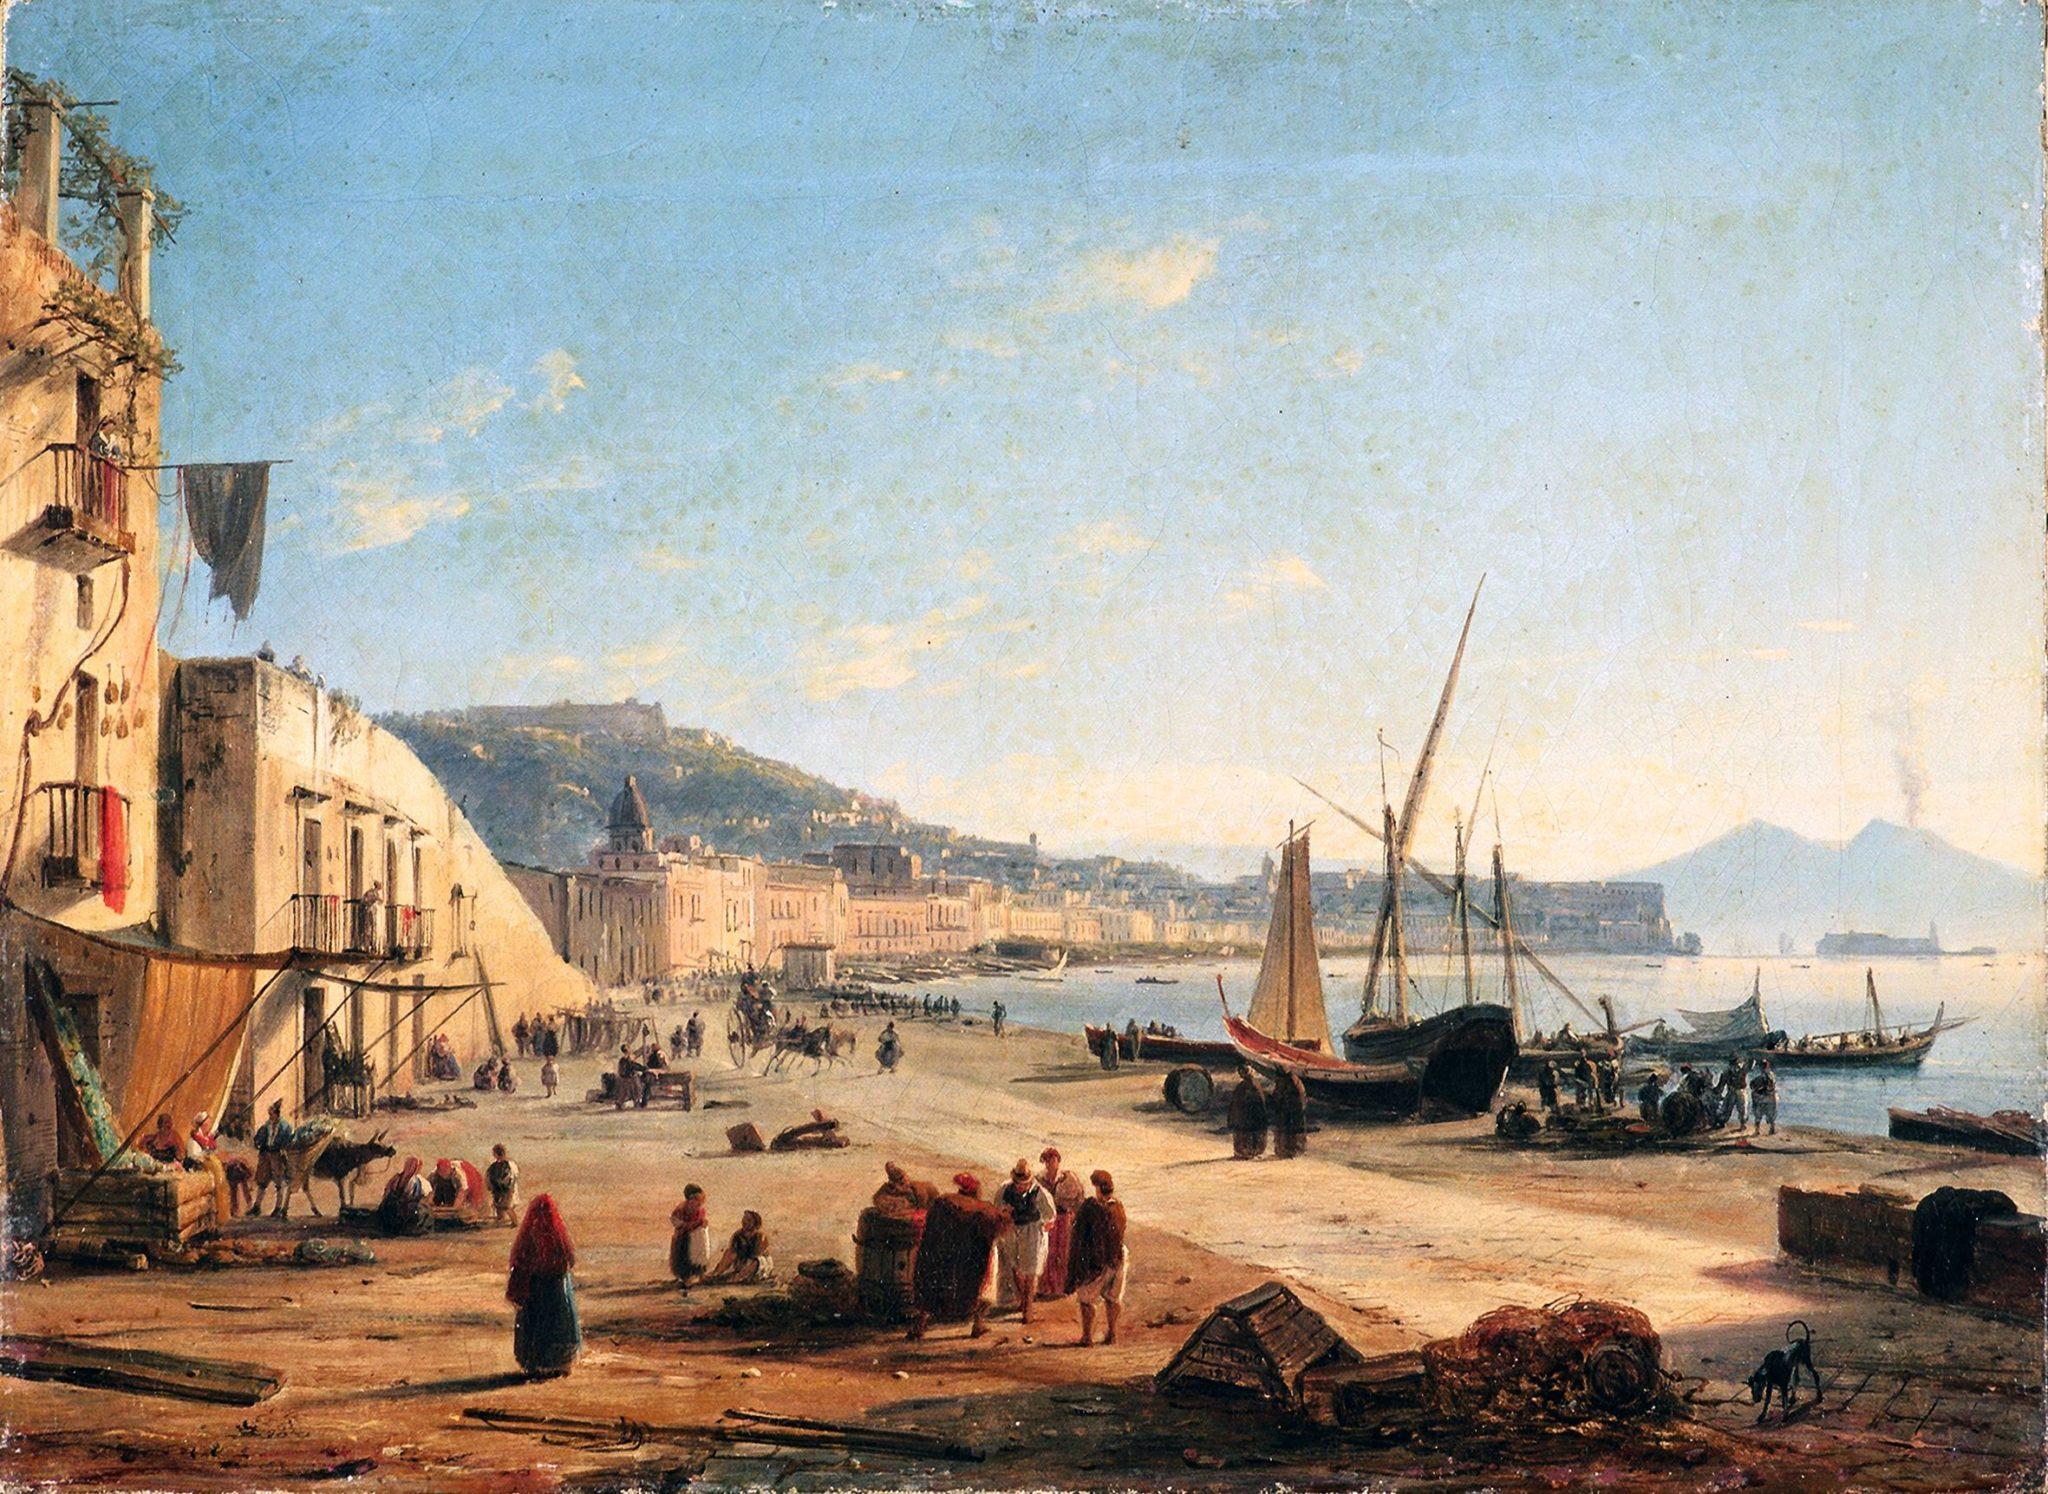 Anton Sminck van Pitloo, Napoli dalla spiaggia di Mergellina, 1829, olio su tela, cm 48x35